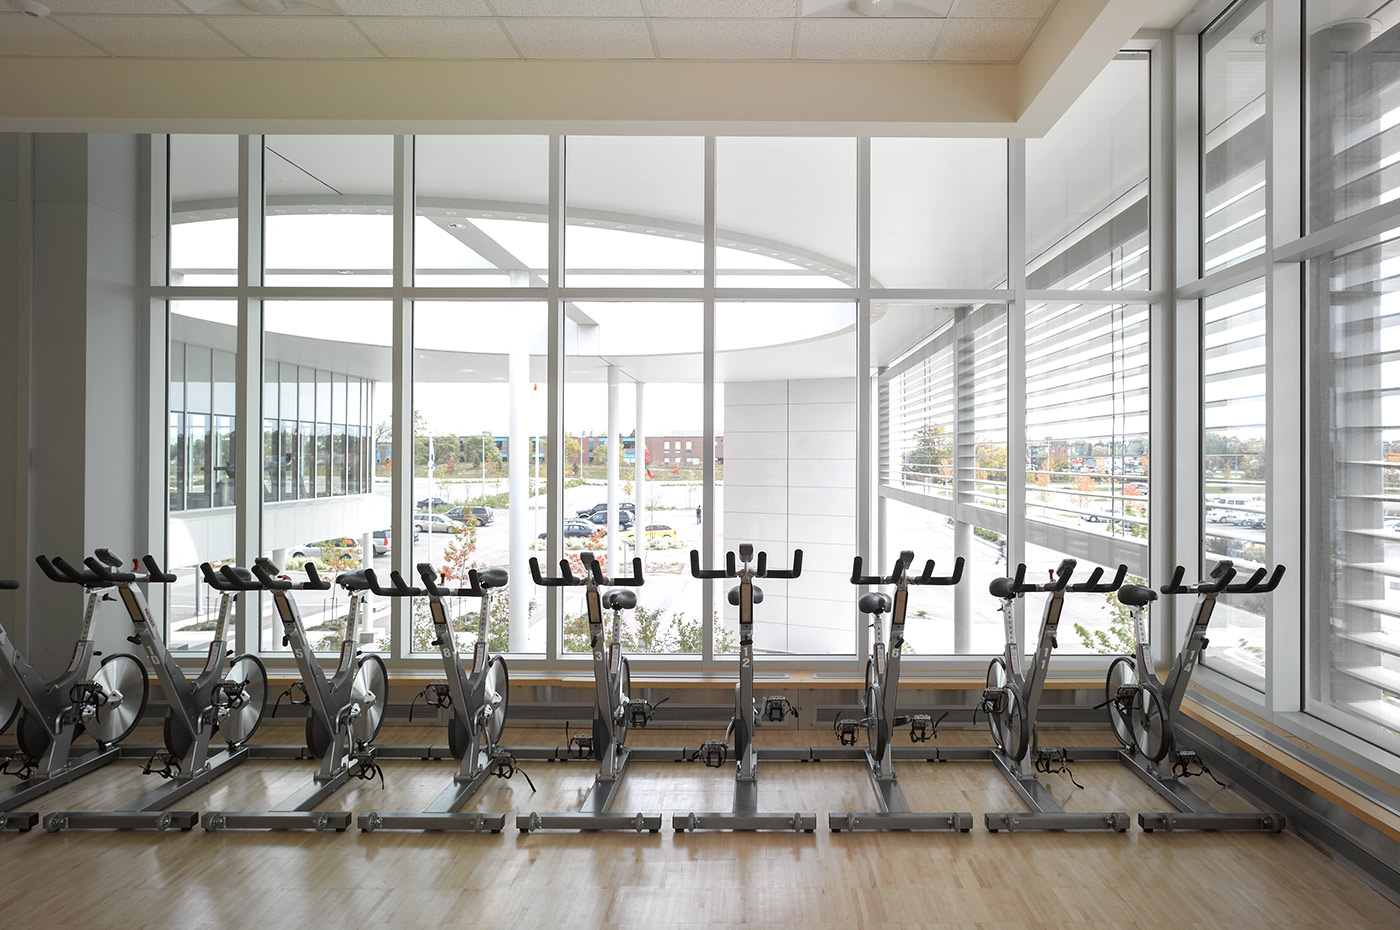 Bradford West Gwillimbury Leisure Centre Fitness Area